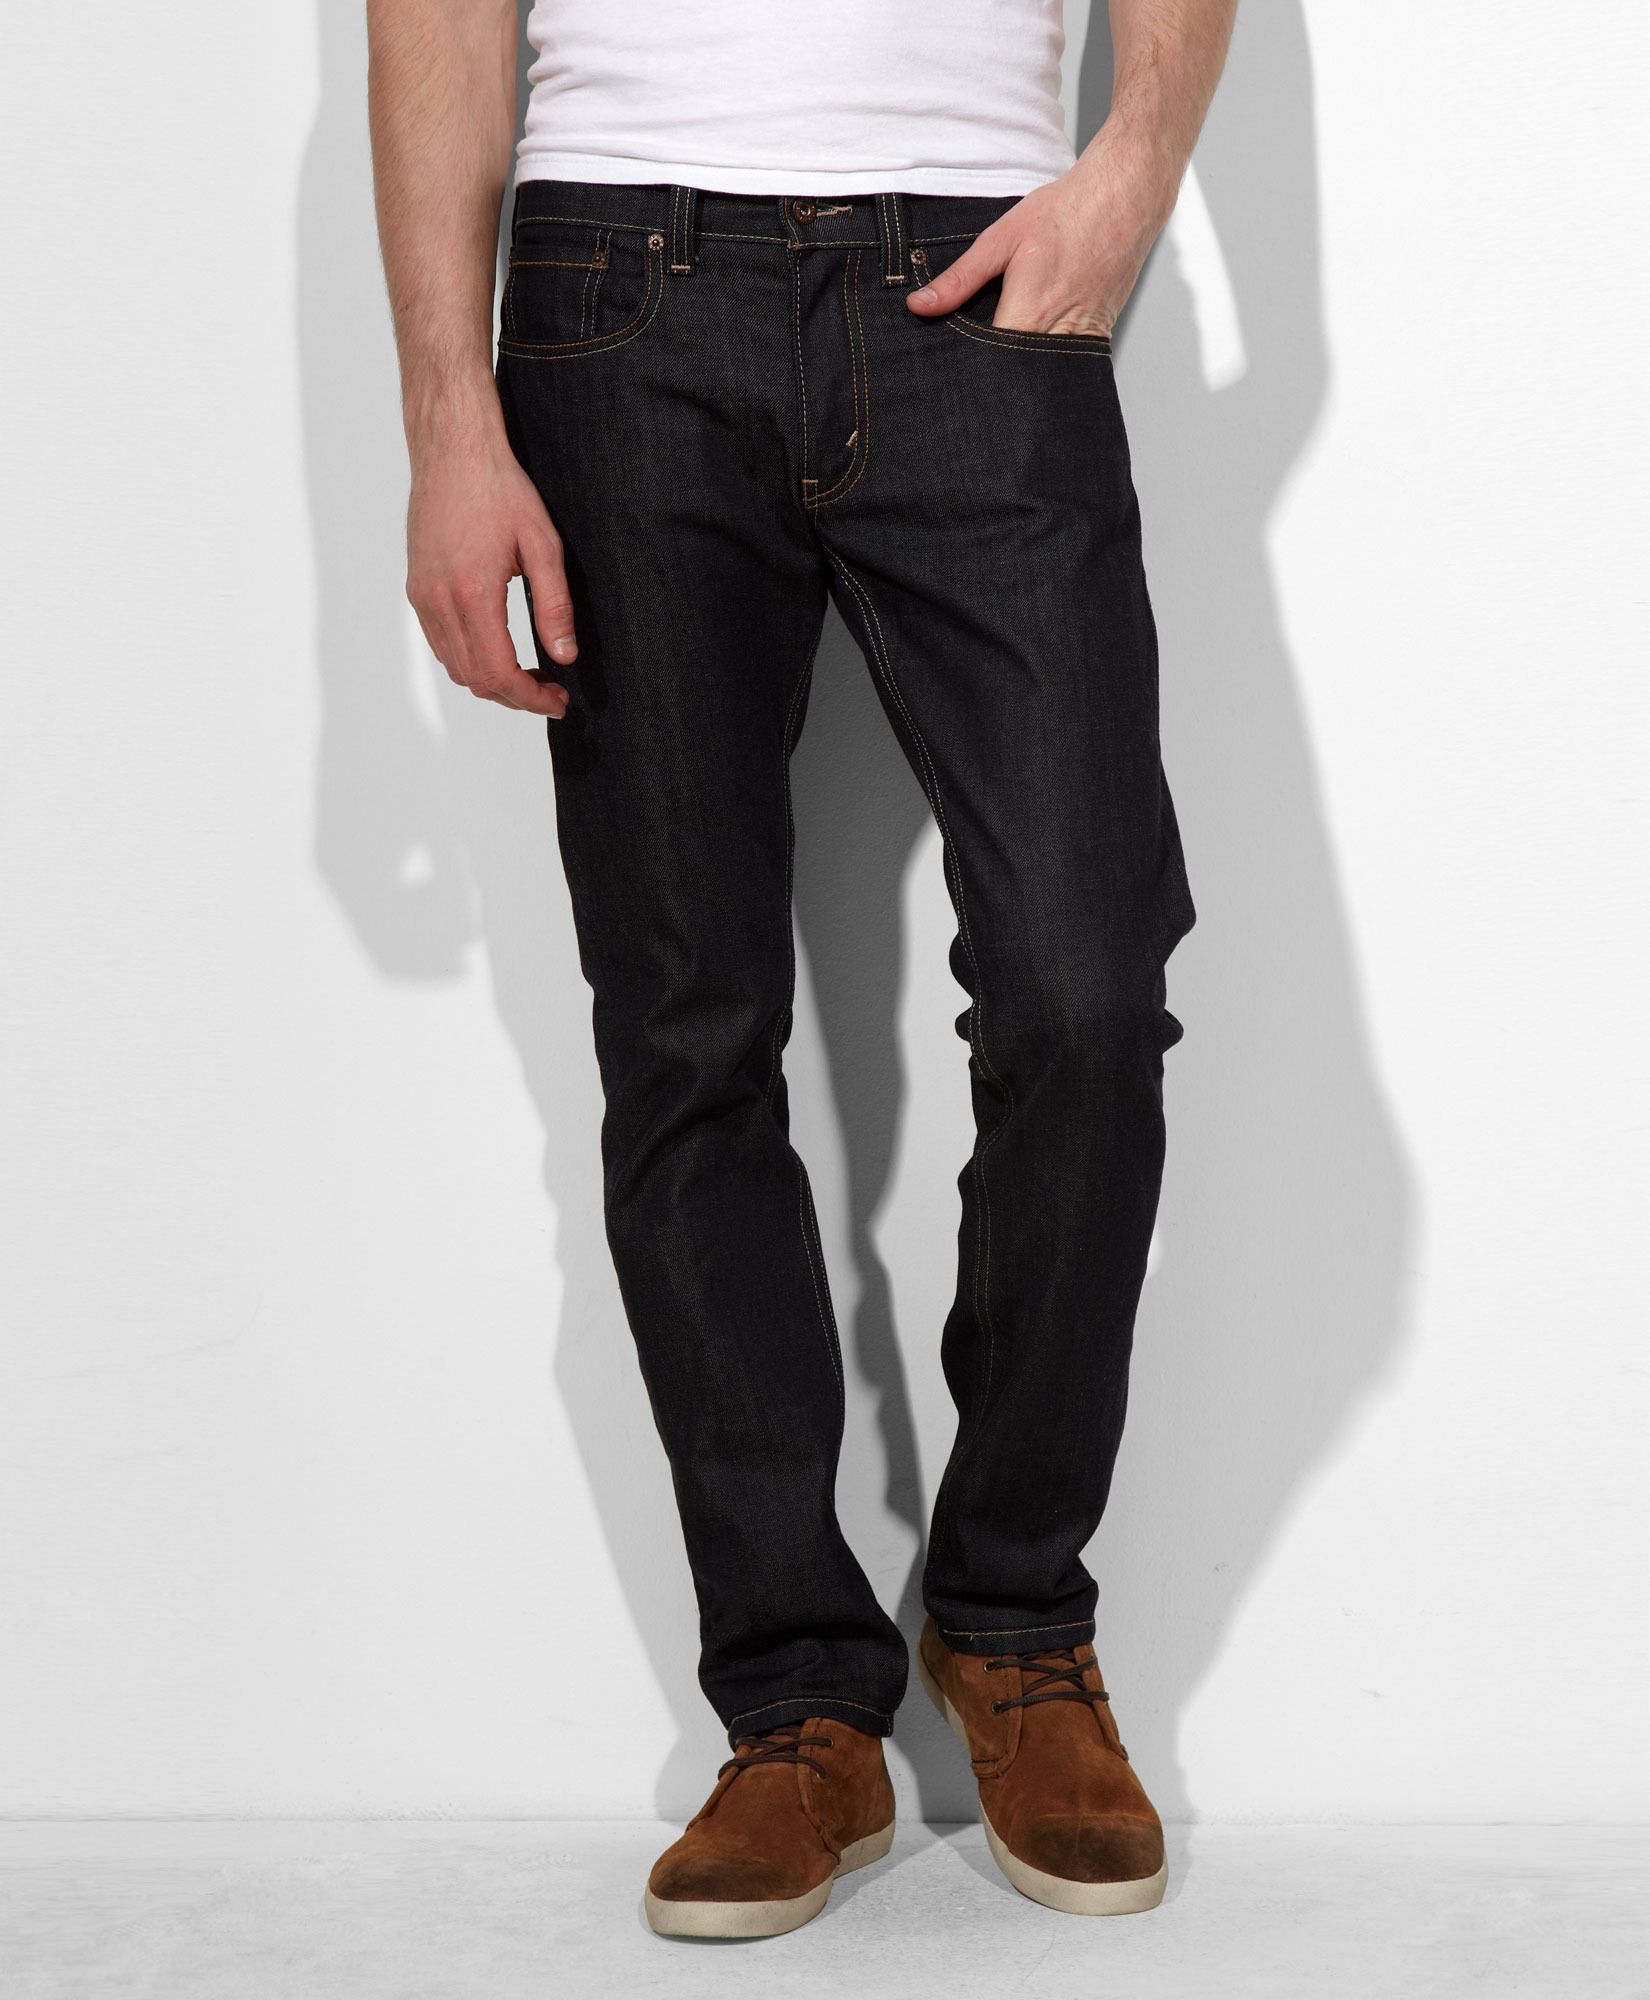 511™ Slim Fit Stretch Jeans - Dark Wash